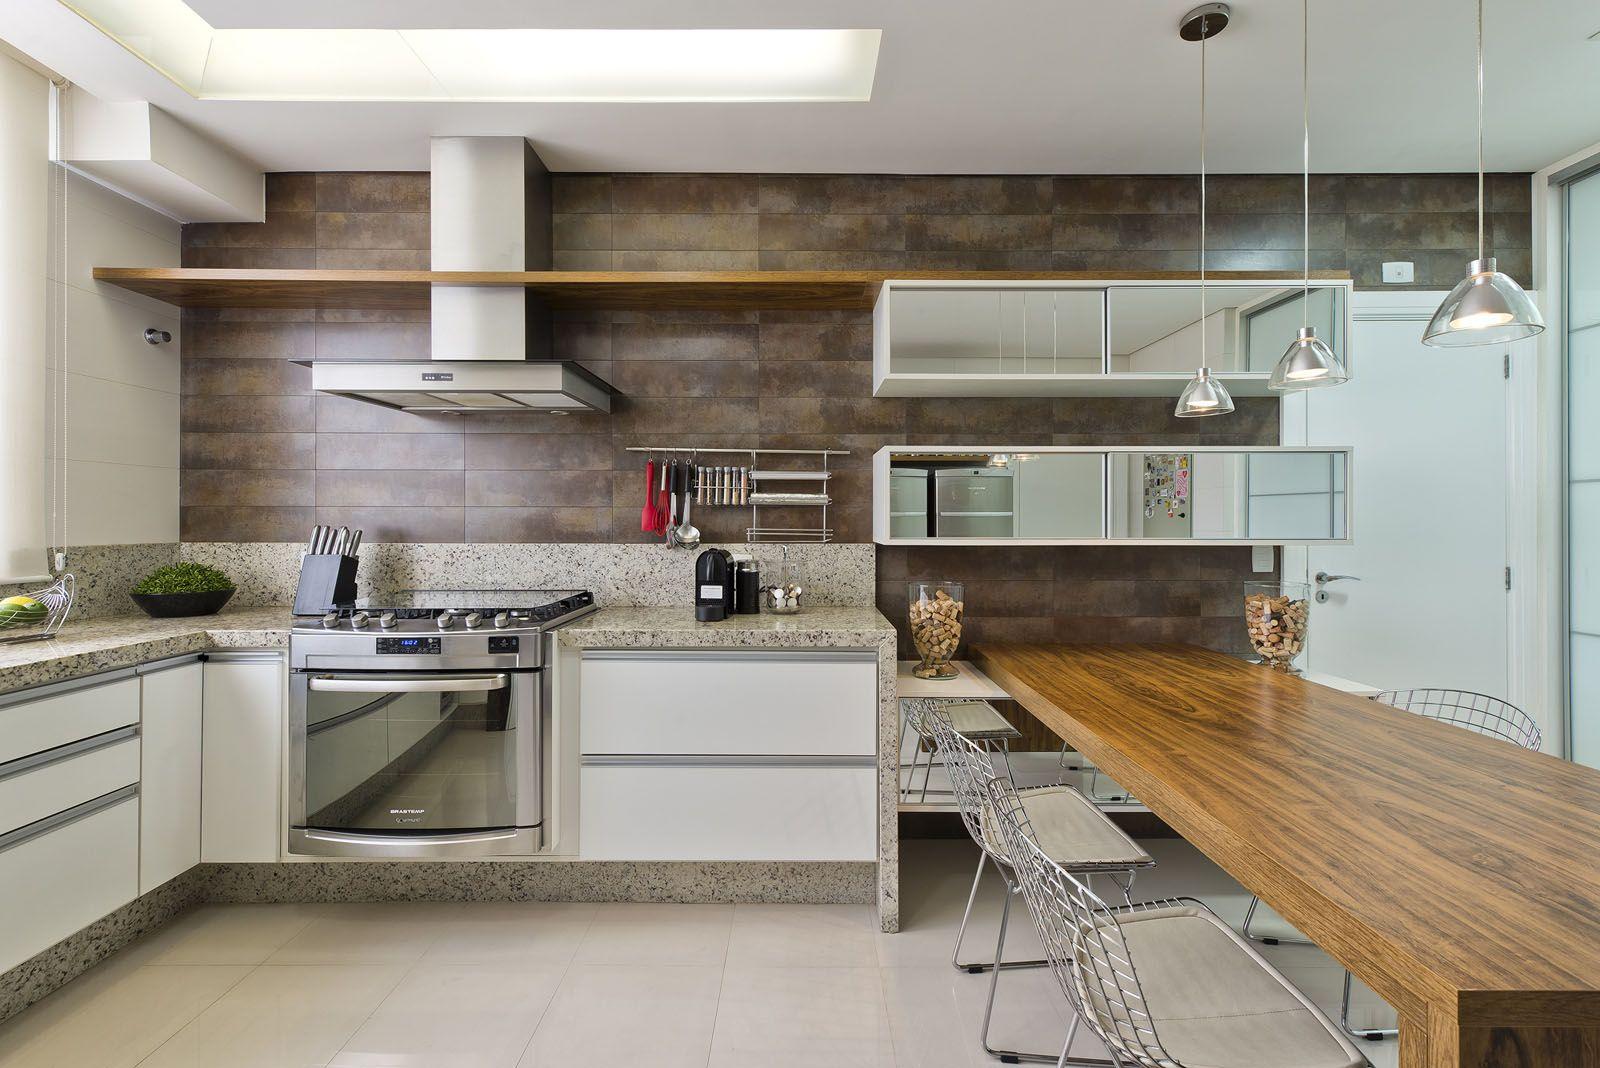 Cozinha Churrasqueira Bancada Granito Modelos Decor Salteado 2 Jpg  ~ Bancada Divisoria Sala Cozinha